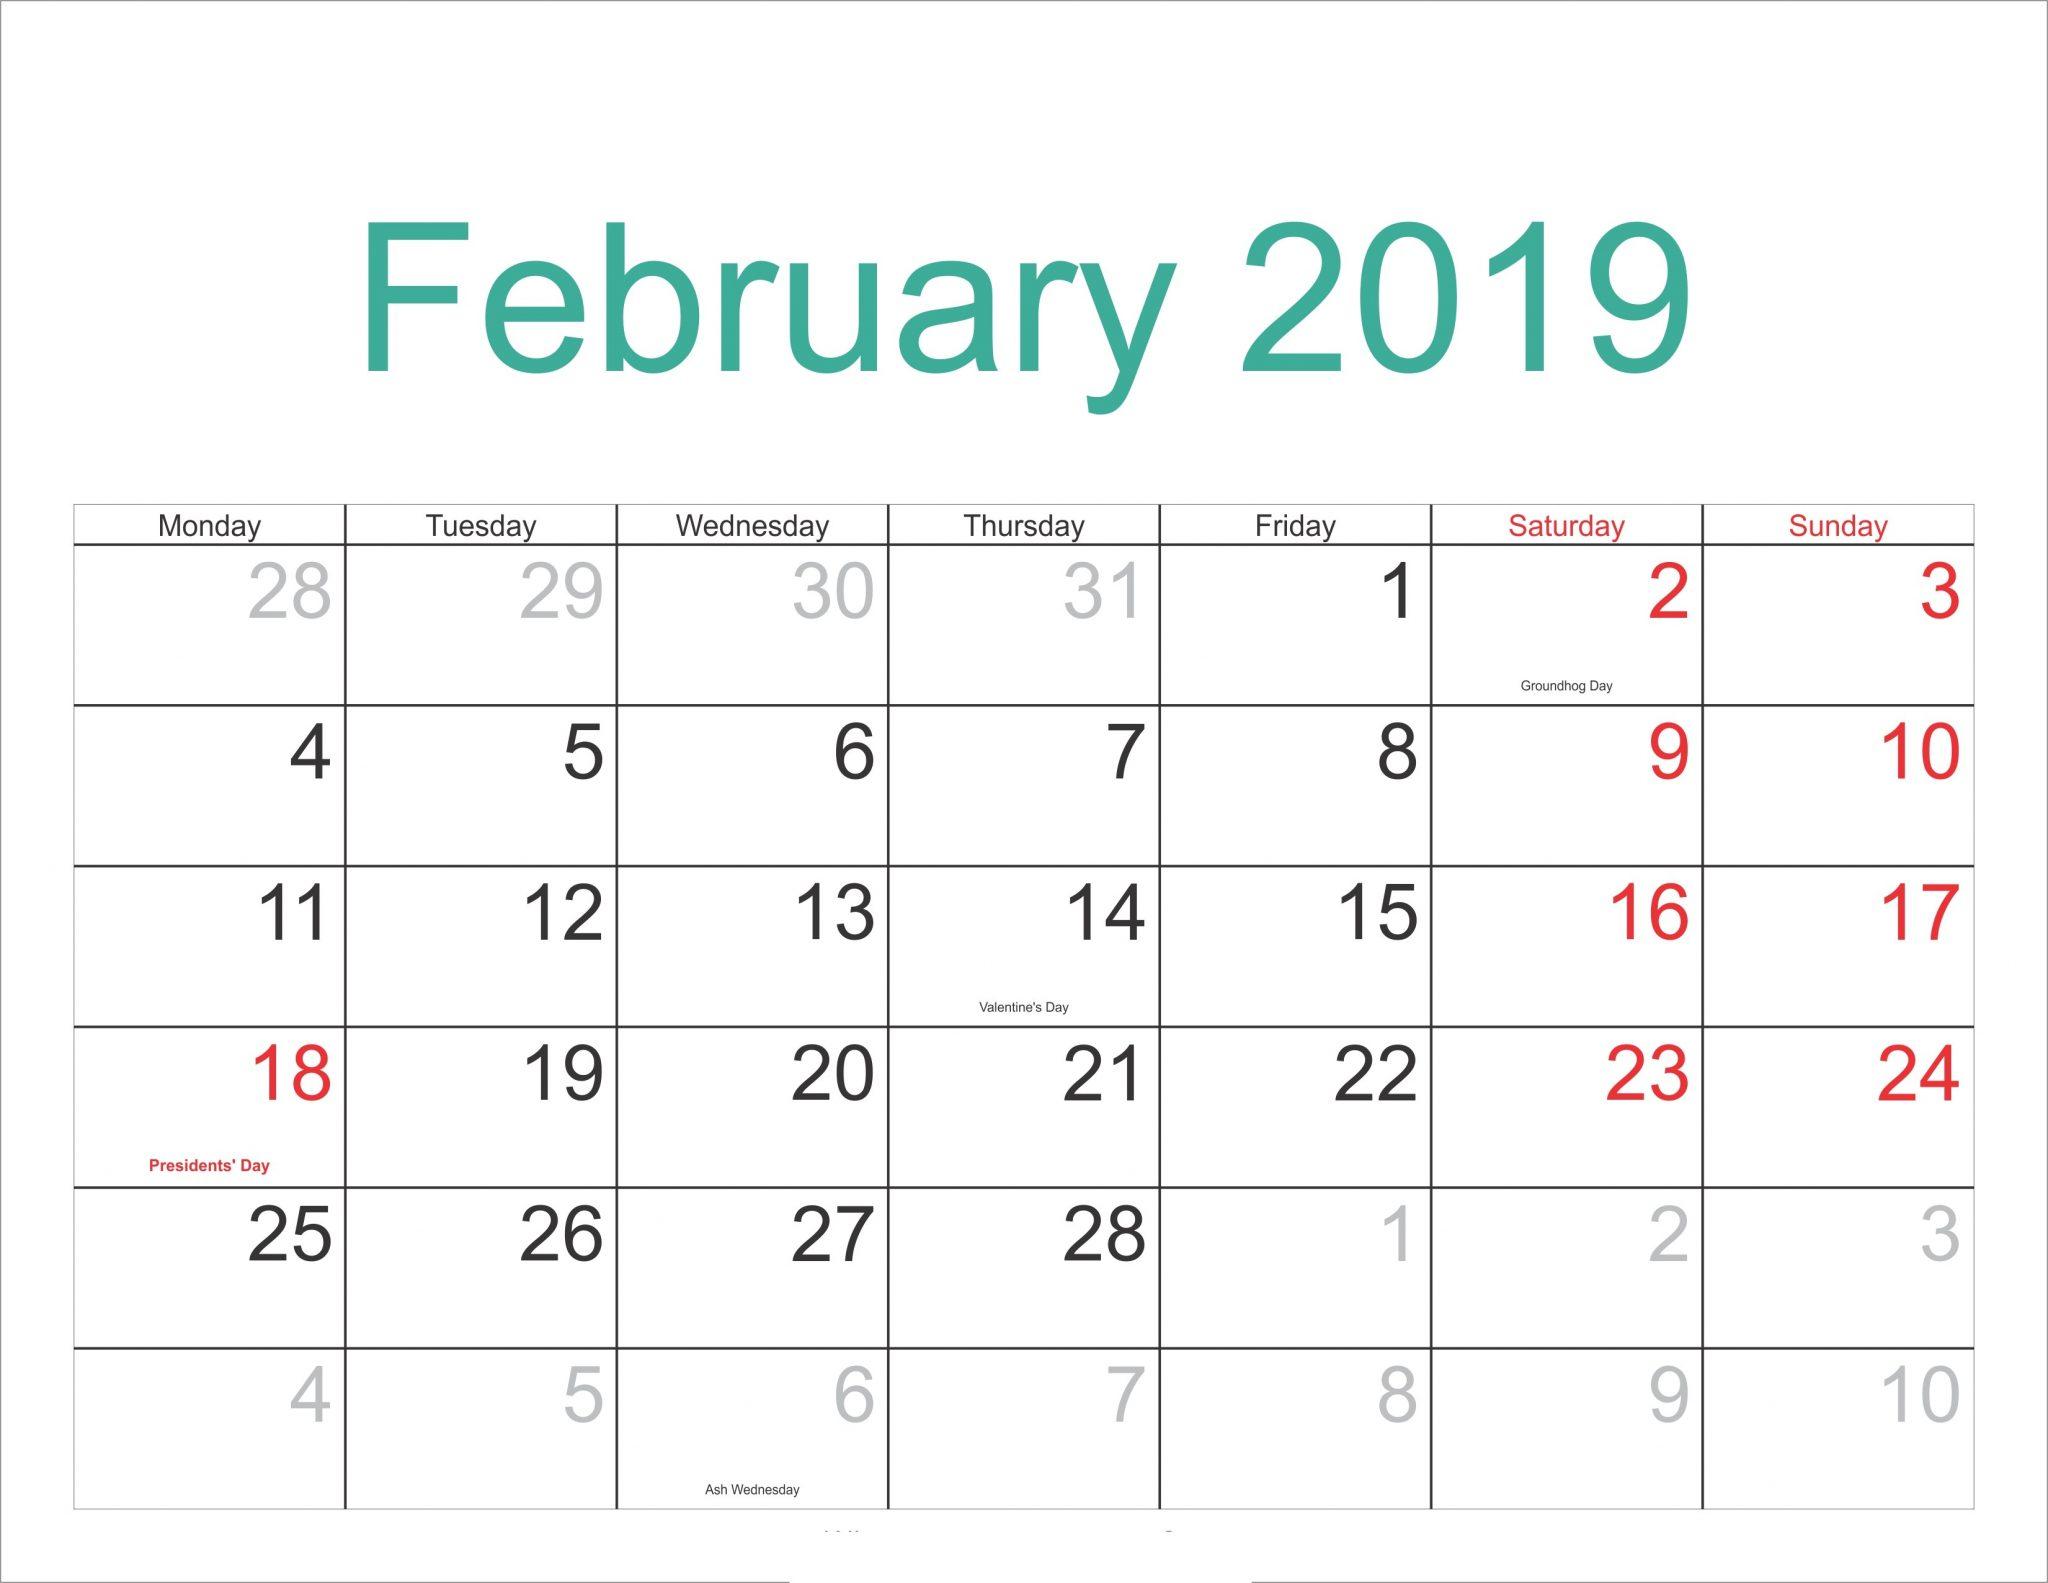 Calendar For February 2019 With Holidays